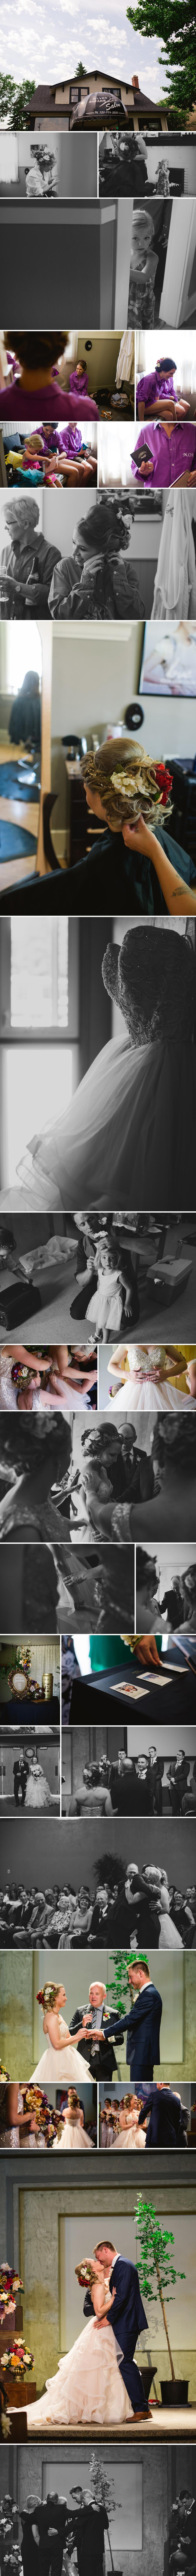 bbcollective_yeg_blog_2017_jessicaandthomas_wedding_photographycomp001.jpg